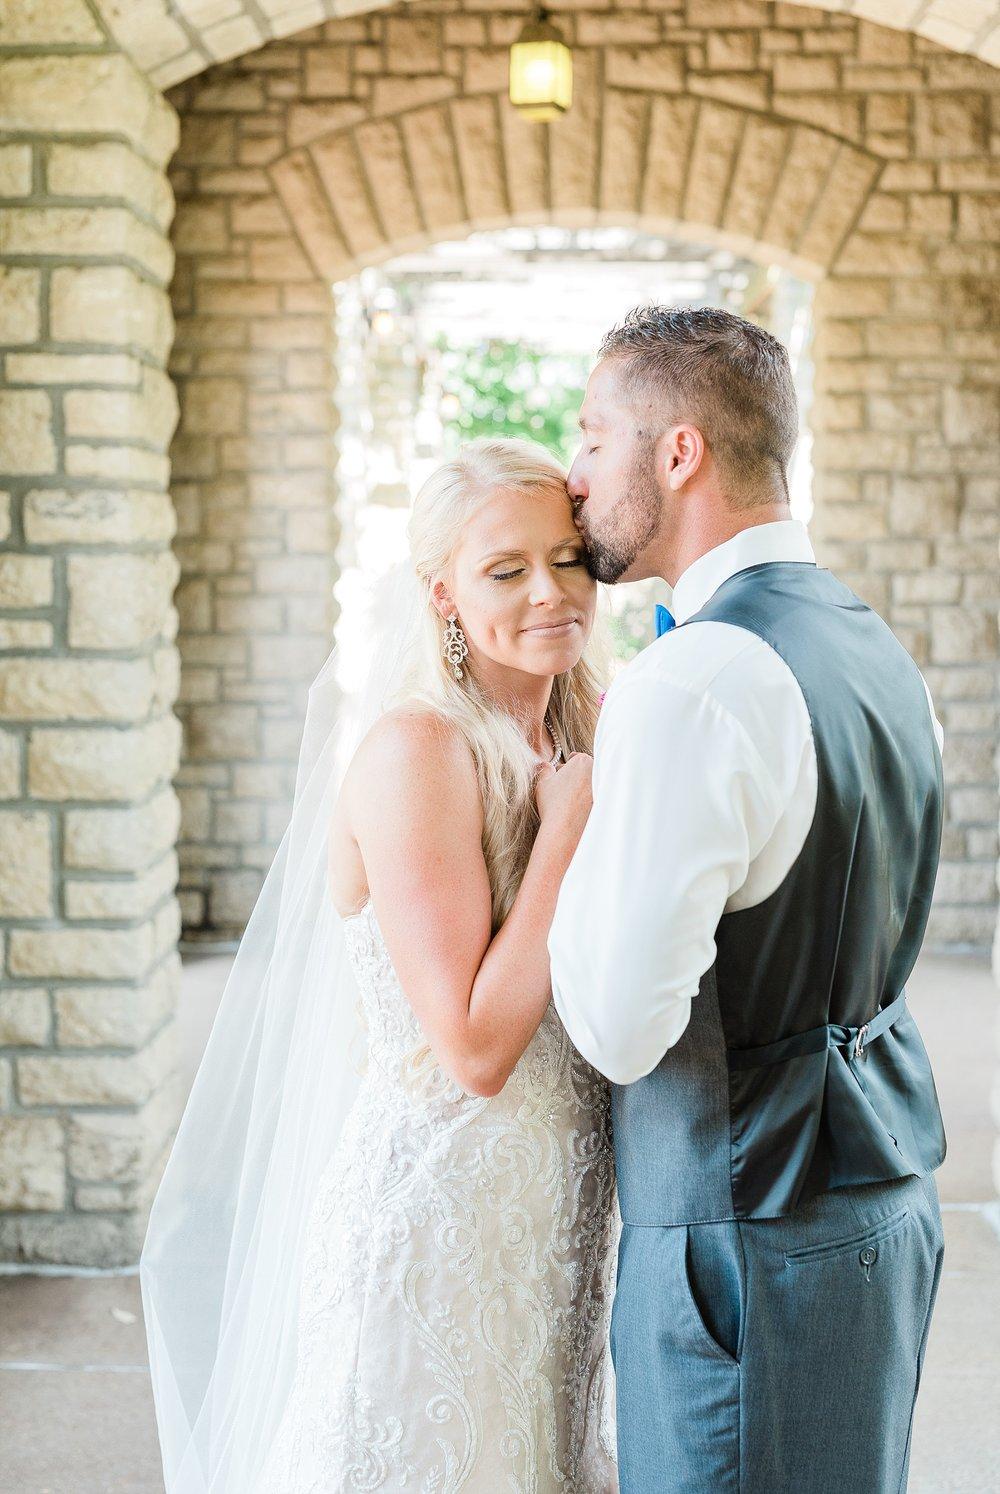 Alan and Heather Horn Wedding by Kelsi Kliethermes Photography Associate - Rachel_0042.jpg